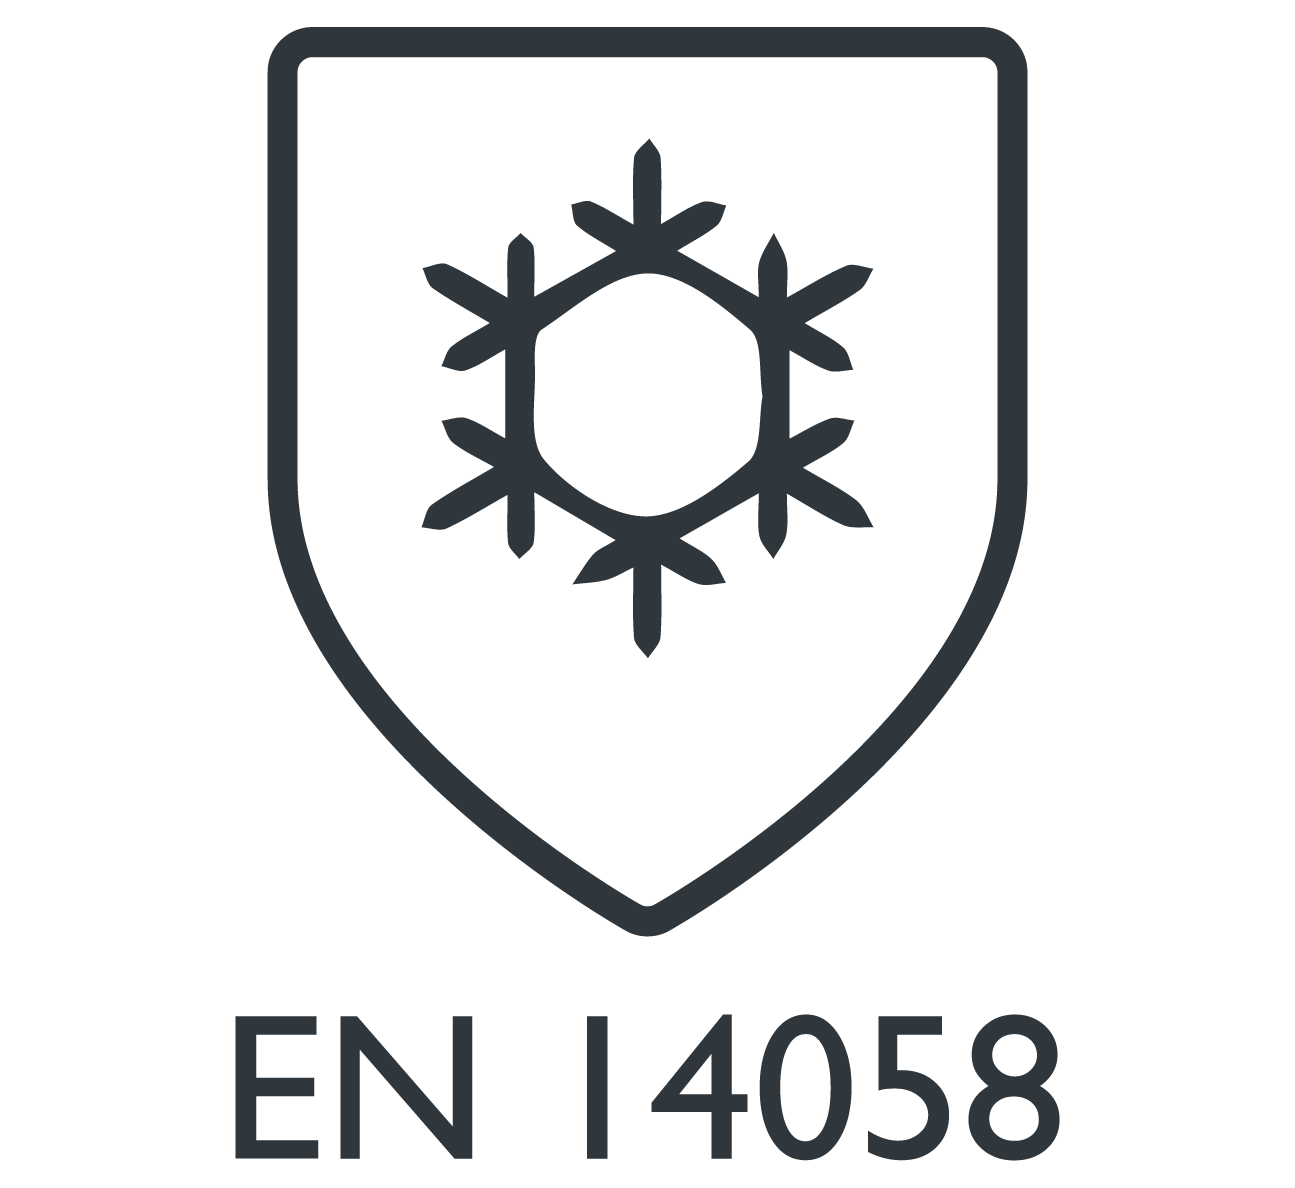 EN 14058 Garments for cold protection